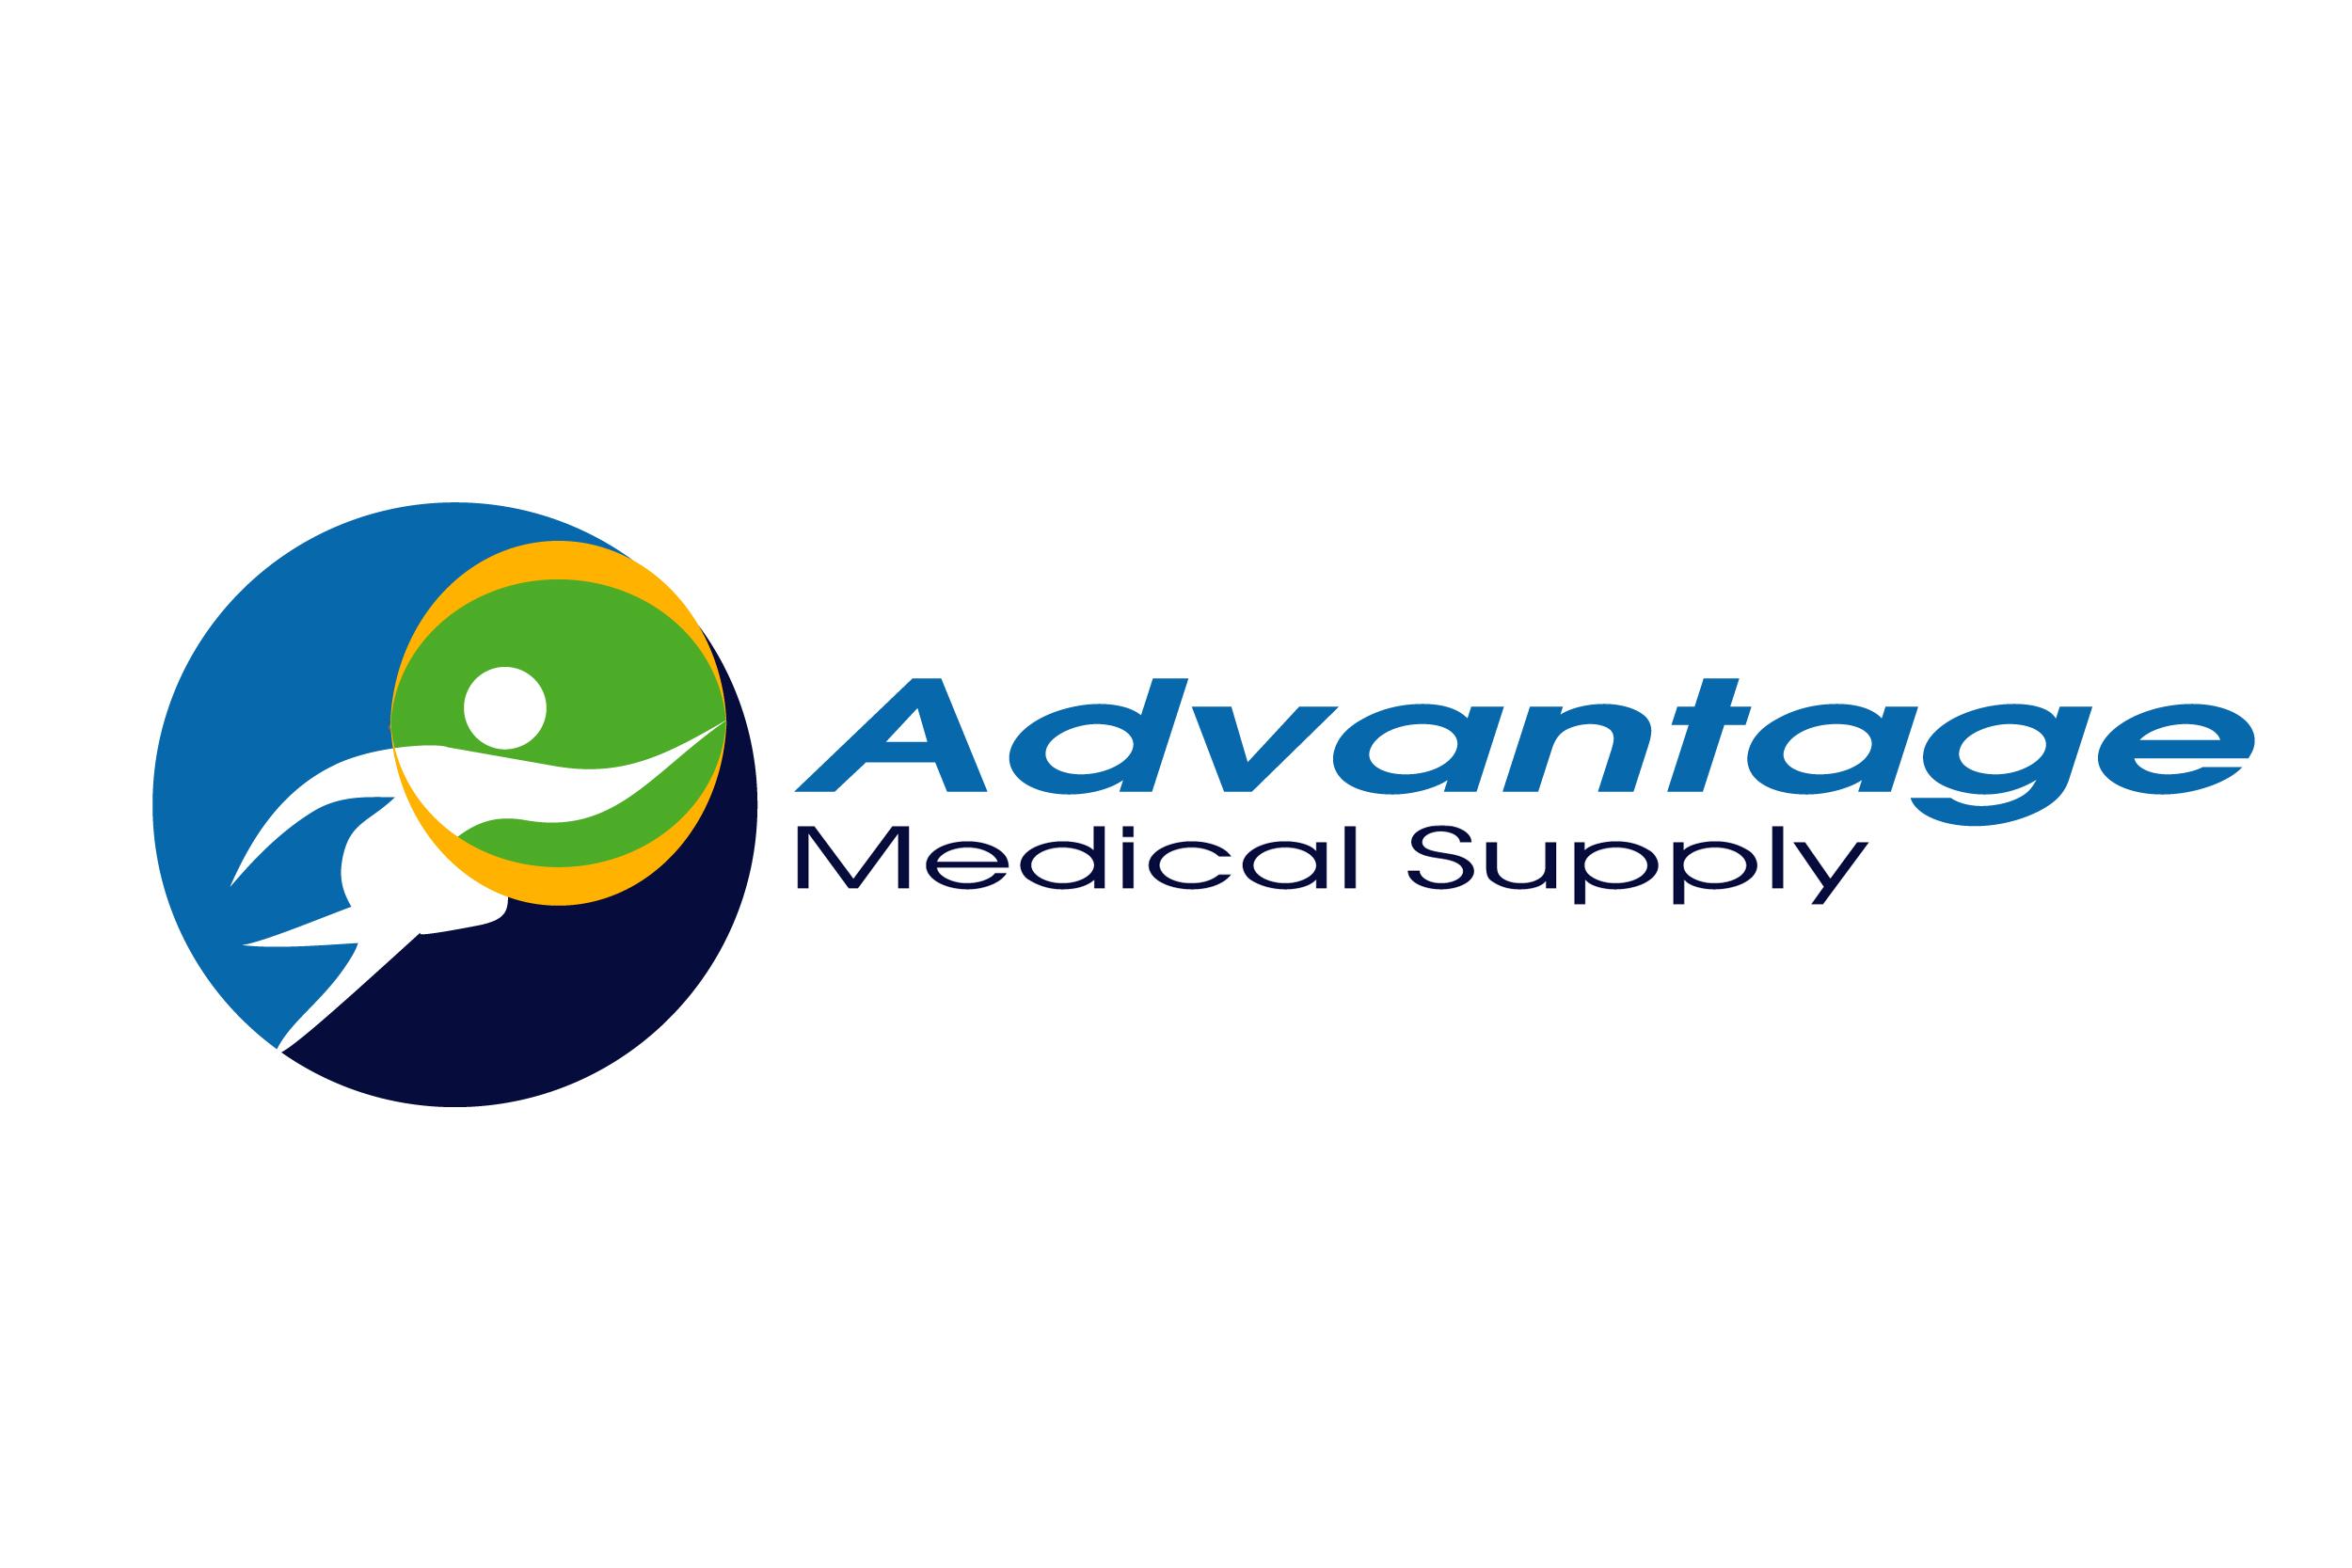 Advantage Medical Supply